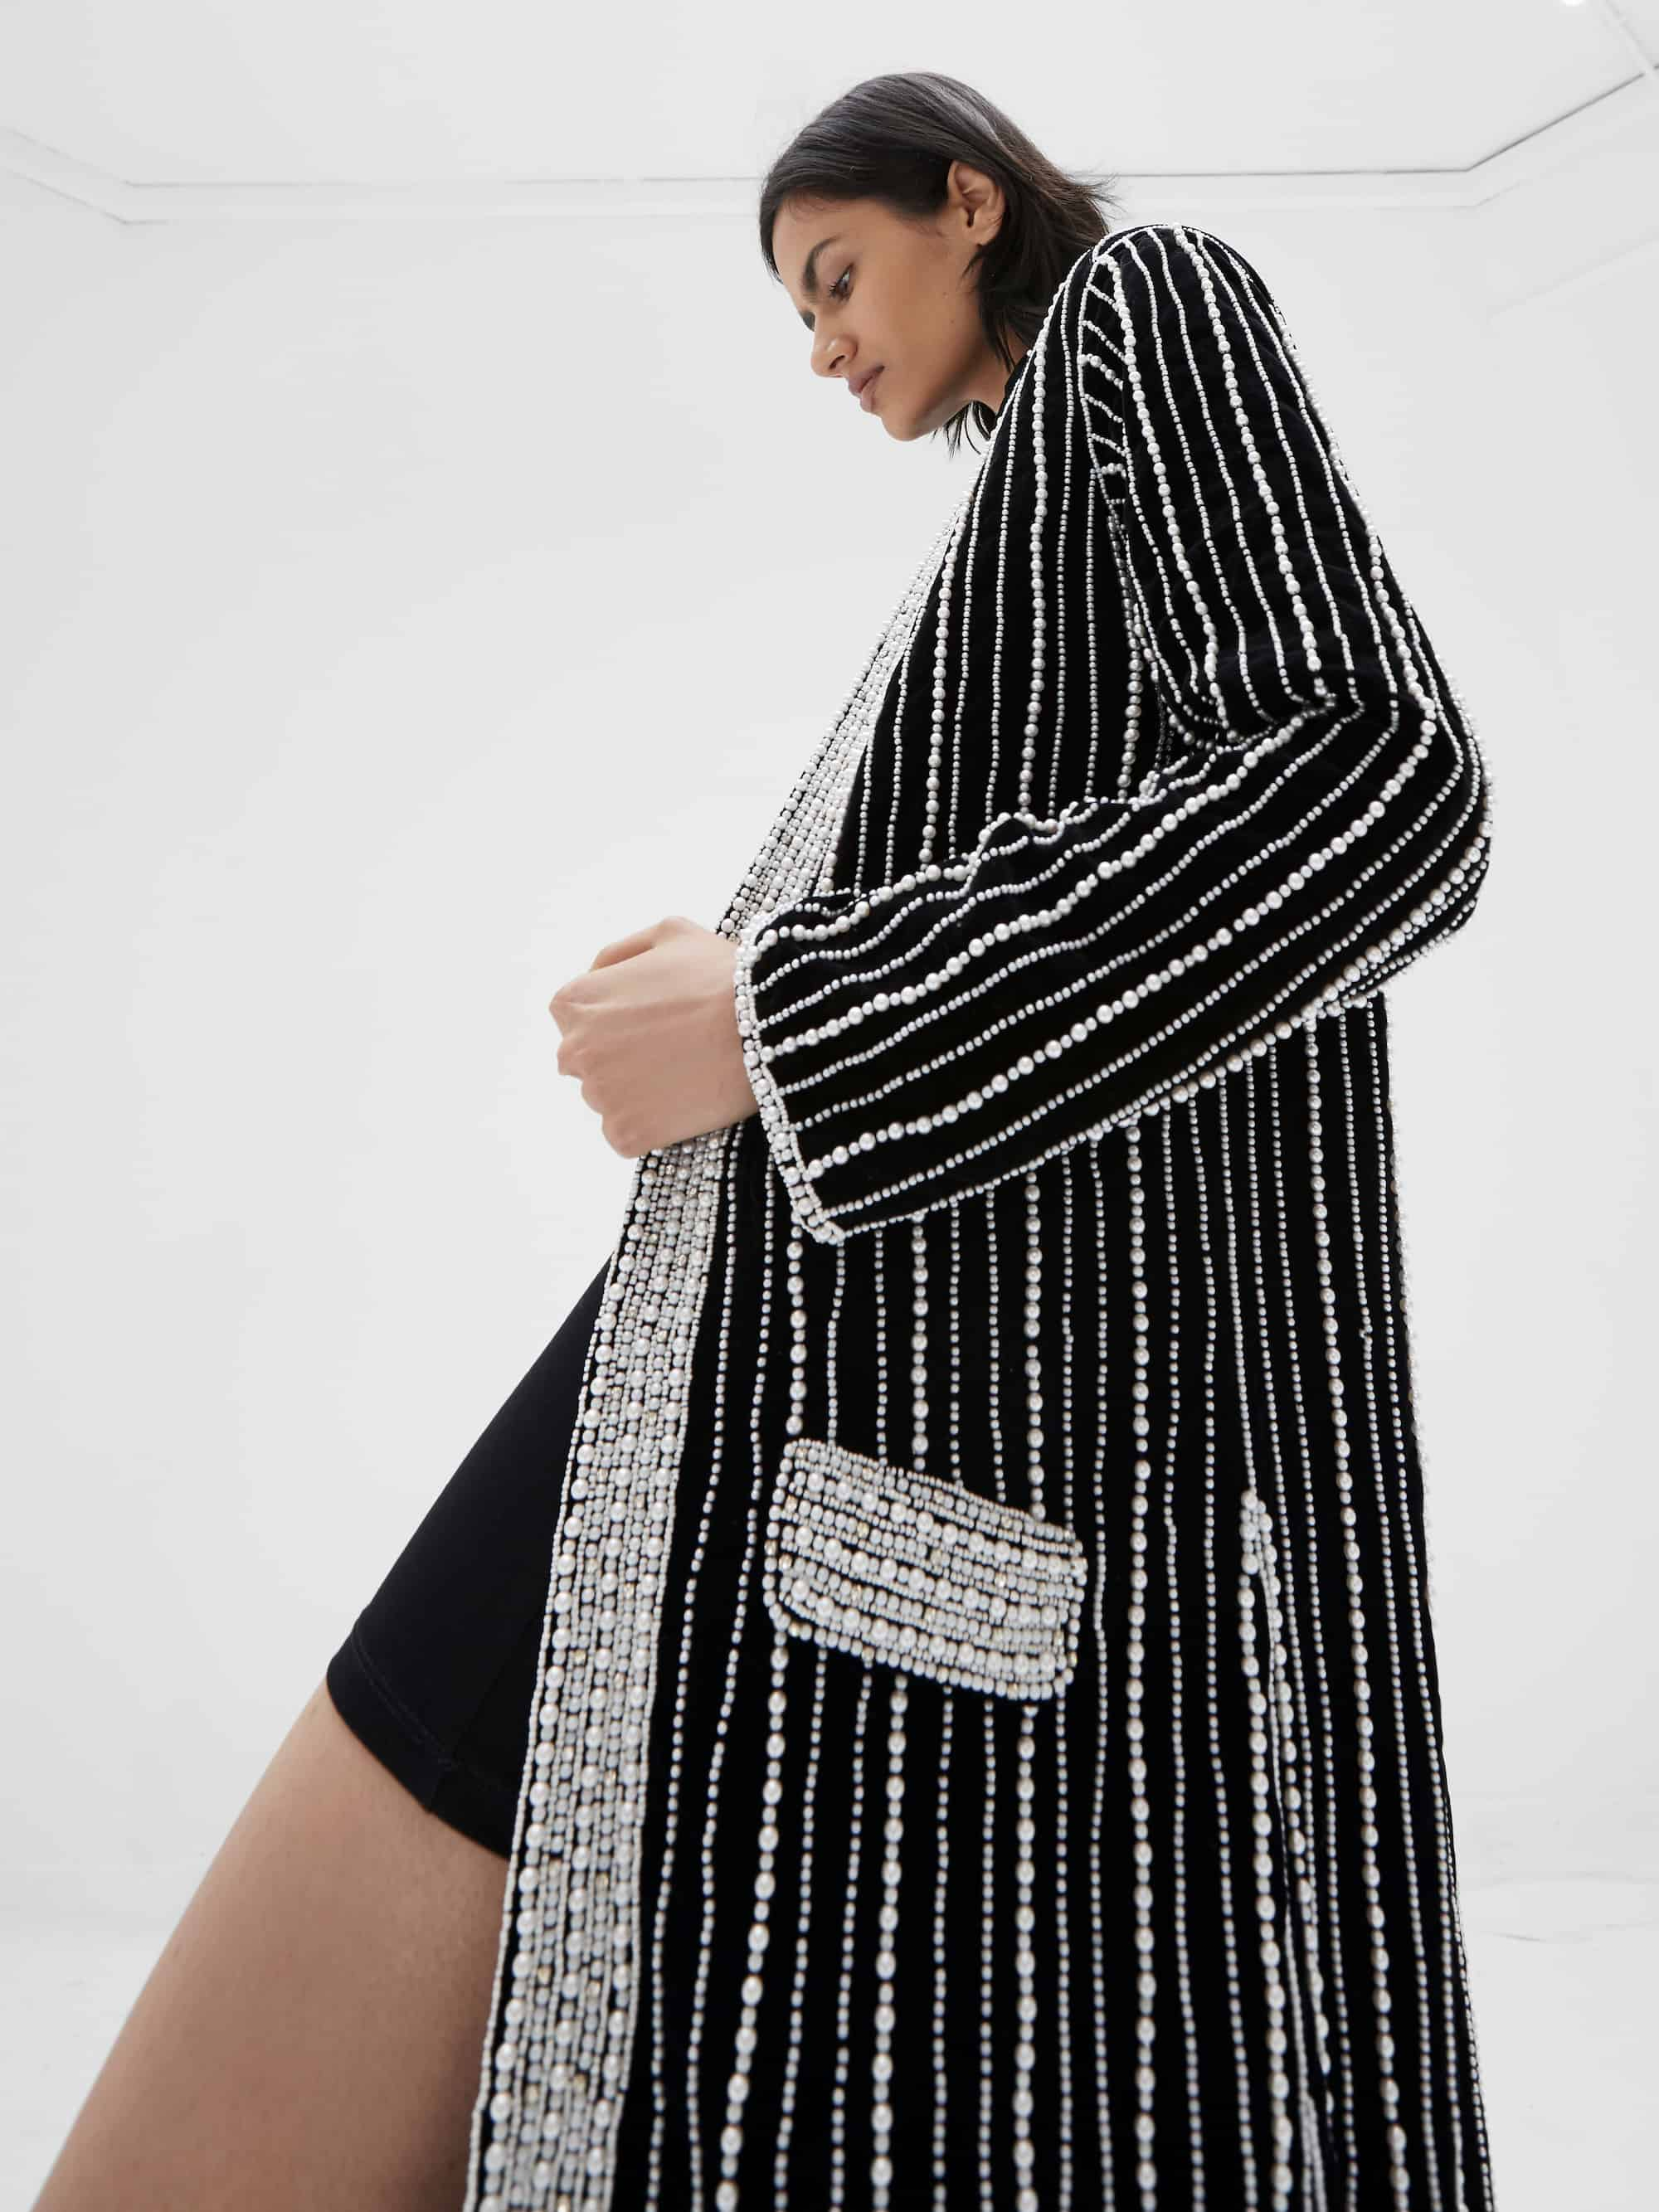 View 5 of model wearing Kasia Kimono in black.